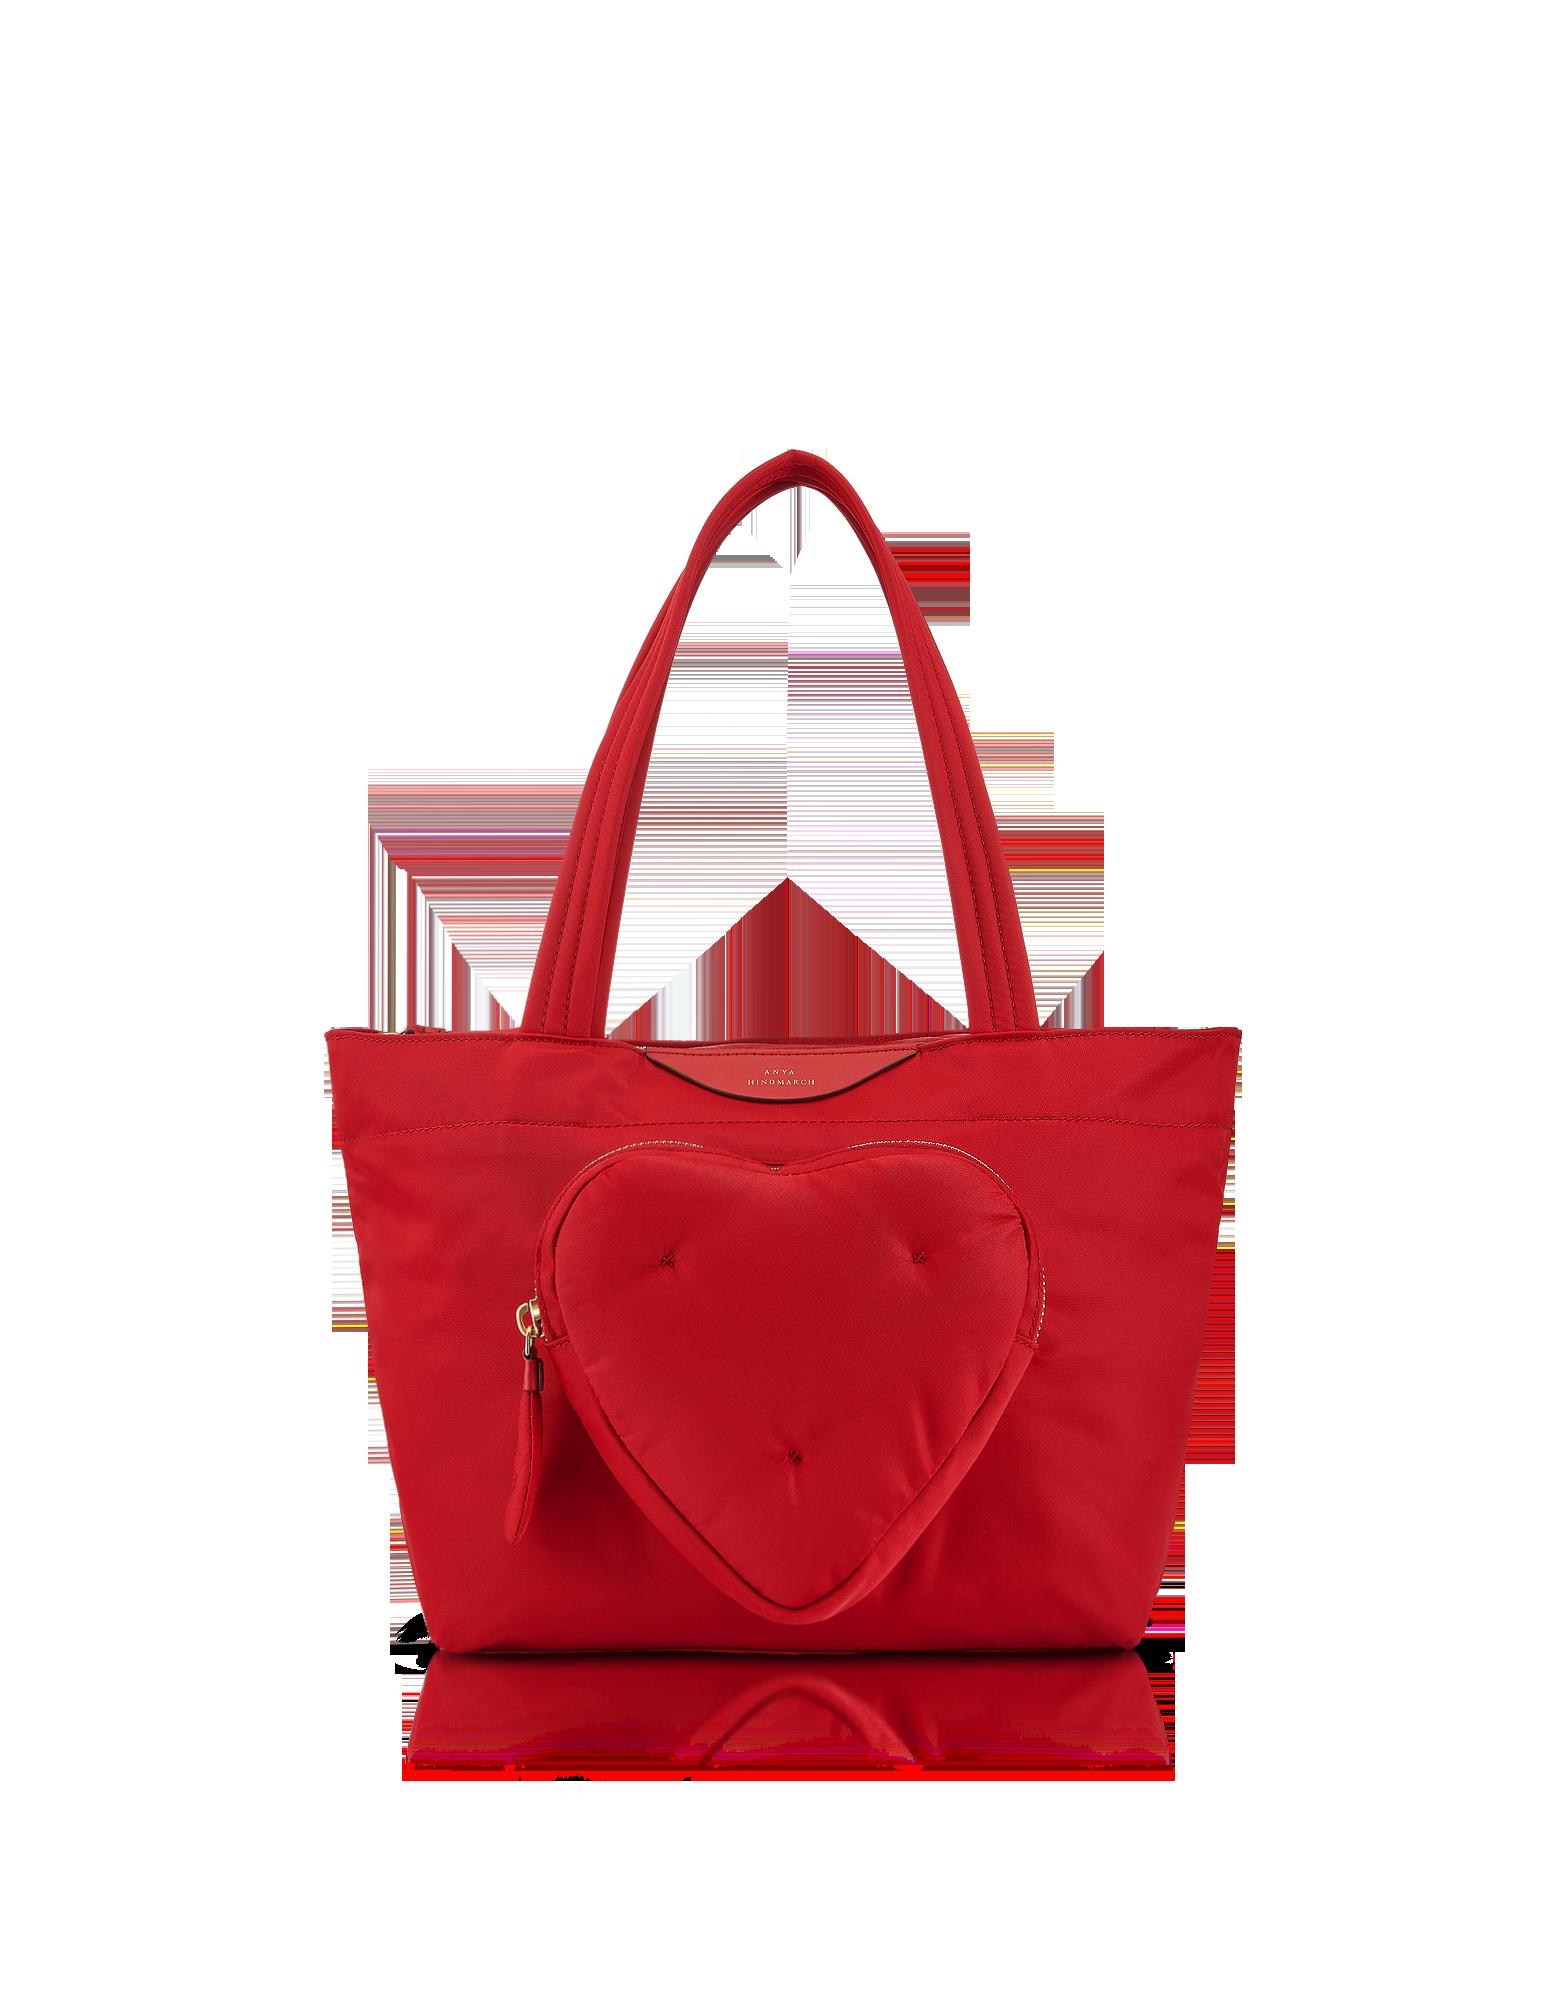 Image of Red Nylon Mini Chubby Heart E/W Tote Bag